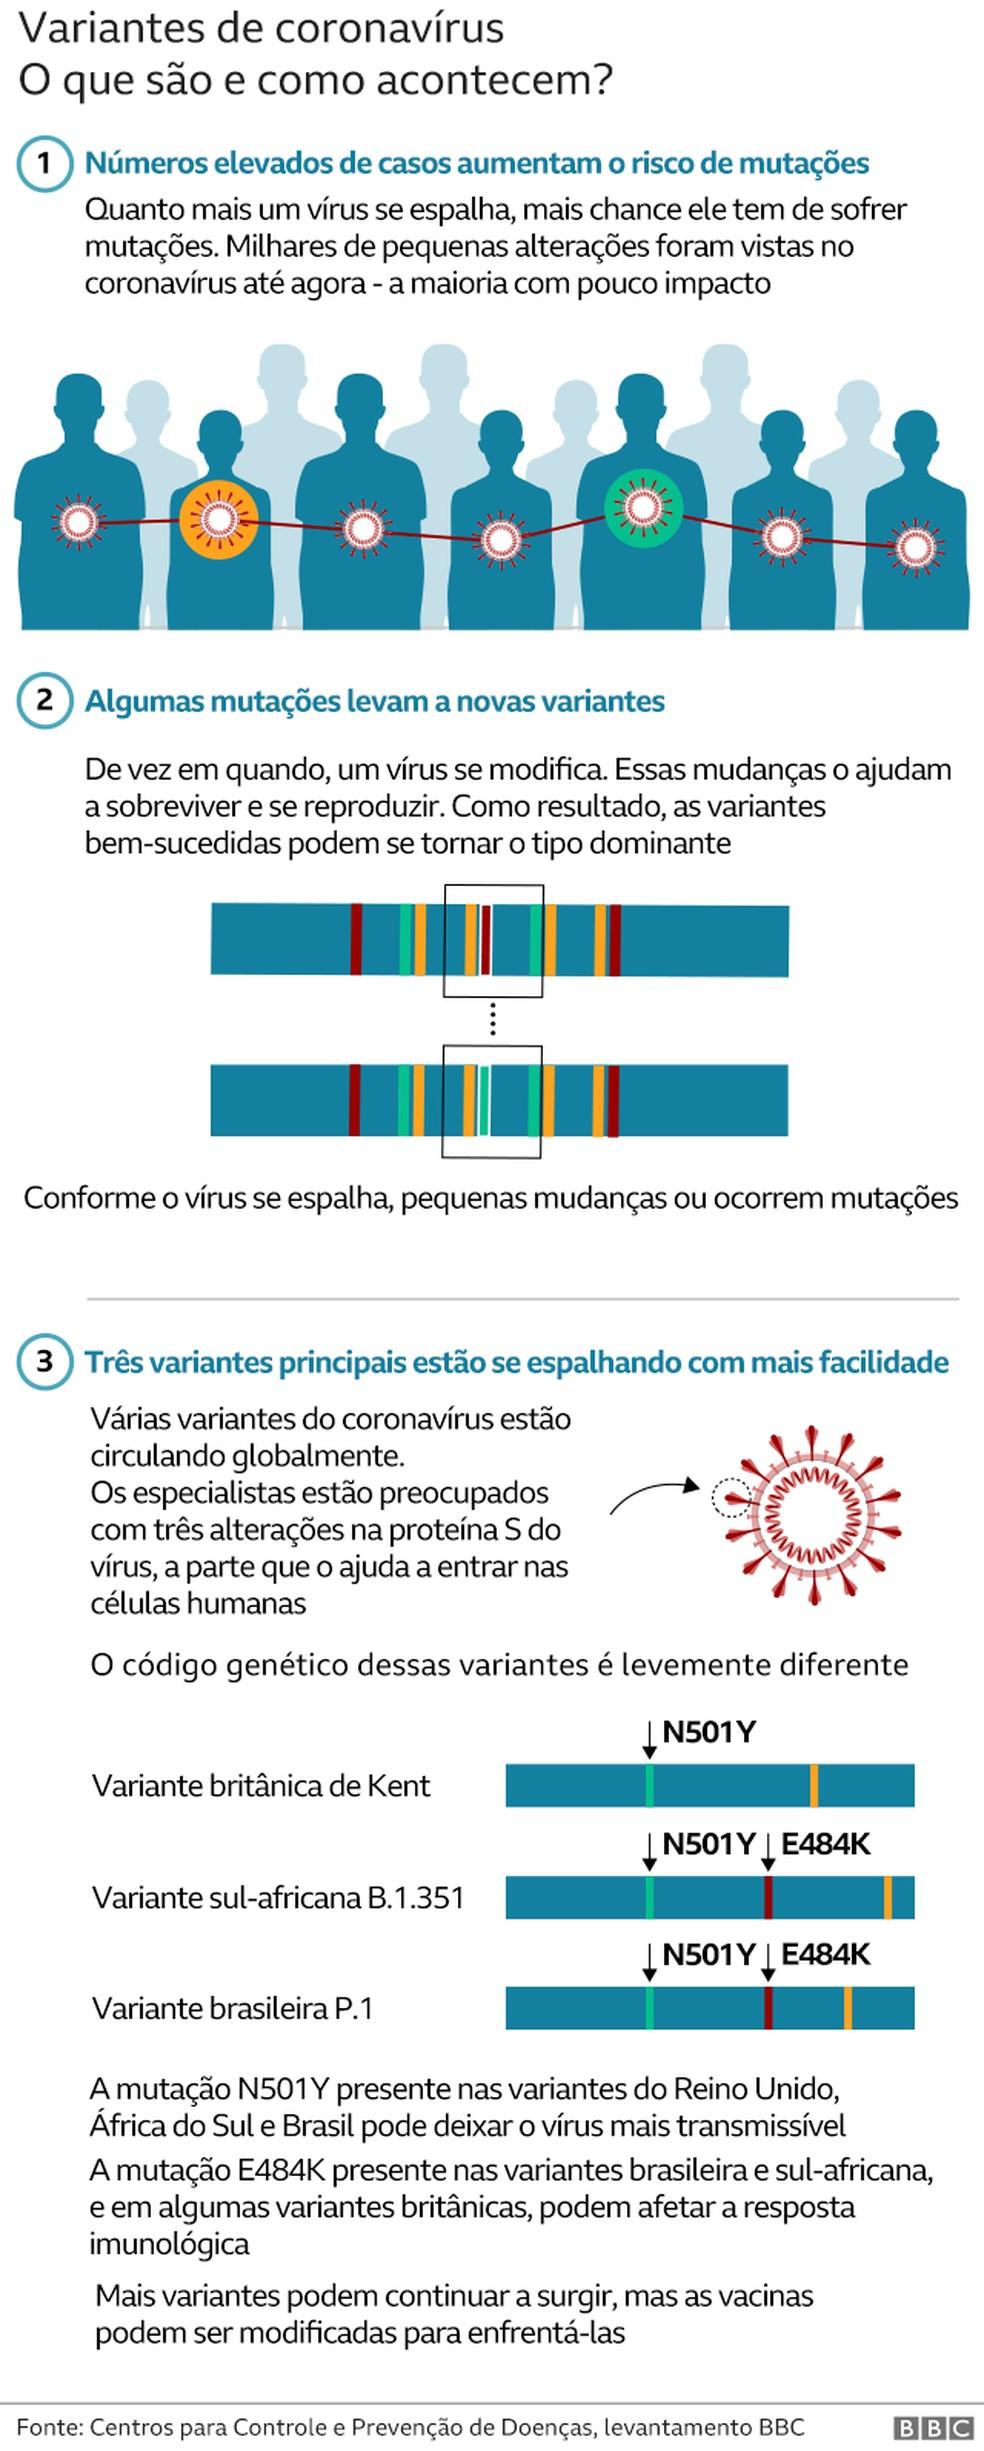 Variantes de Coronavírus — Foto: BBC